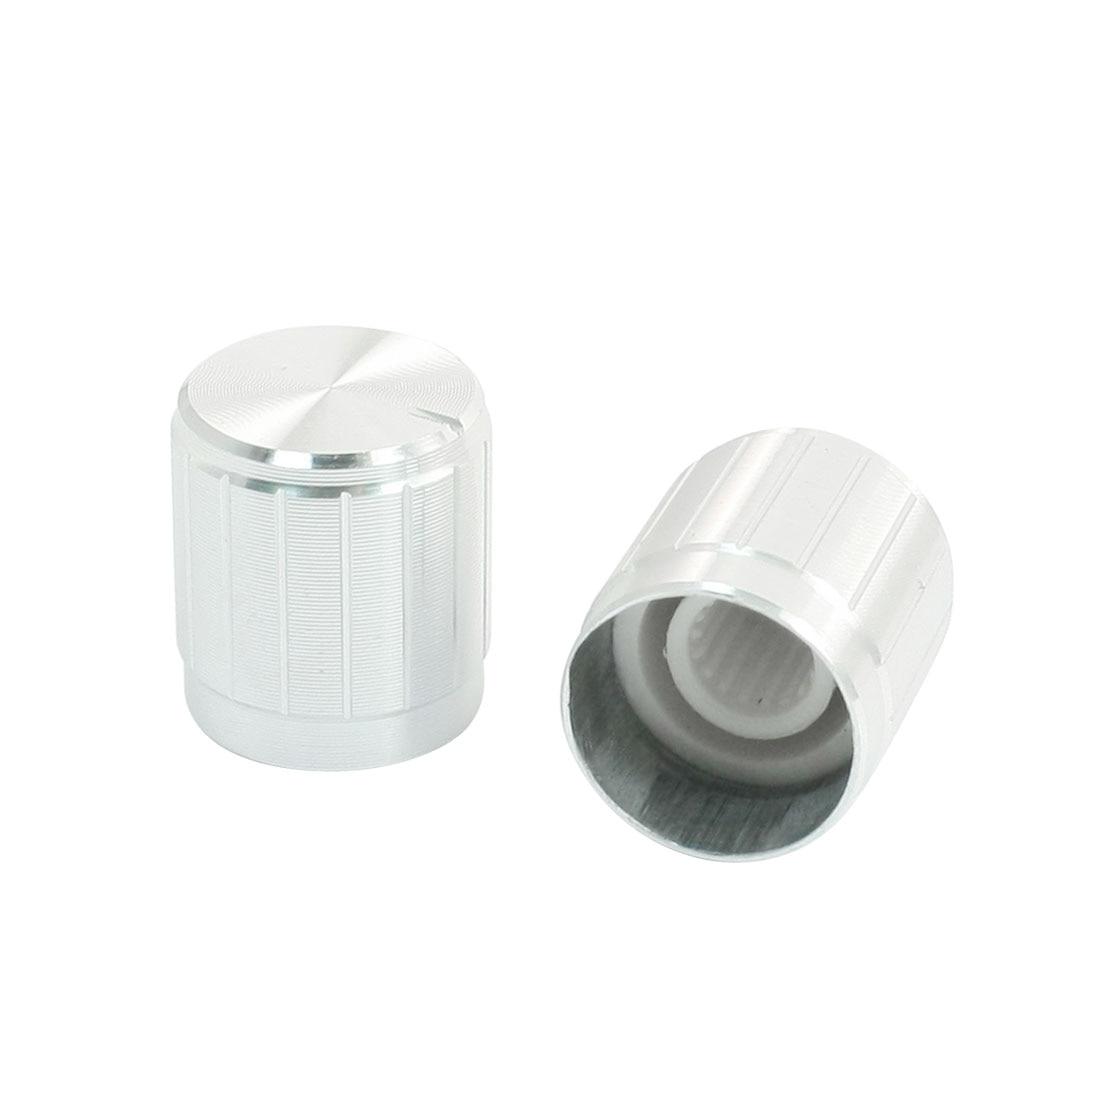 uxcell 30Pcs 6mm Shaft Insert Dia Non-slip Potentiometer Control Knobs Black 15 x 16mm